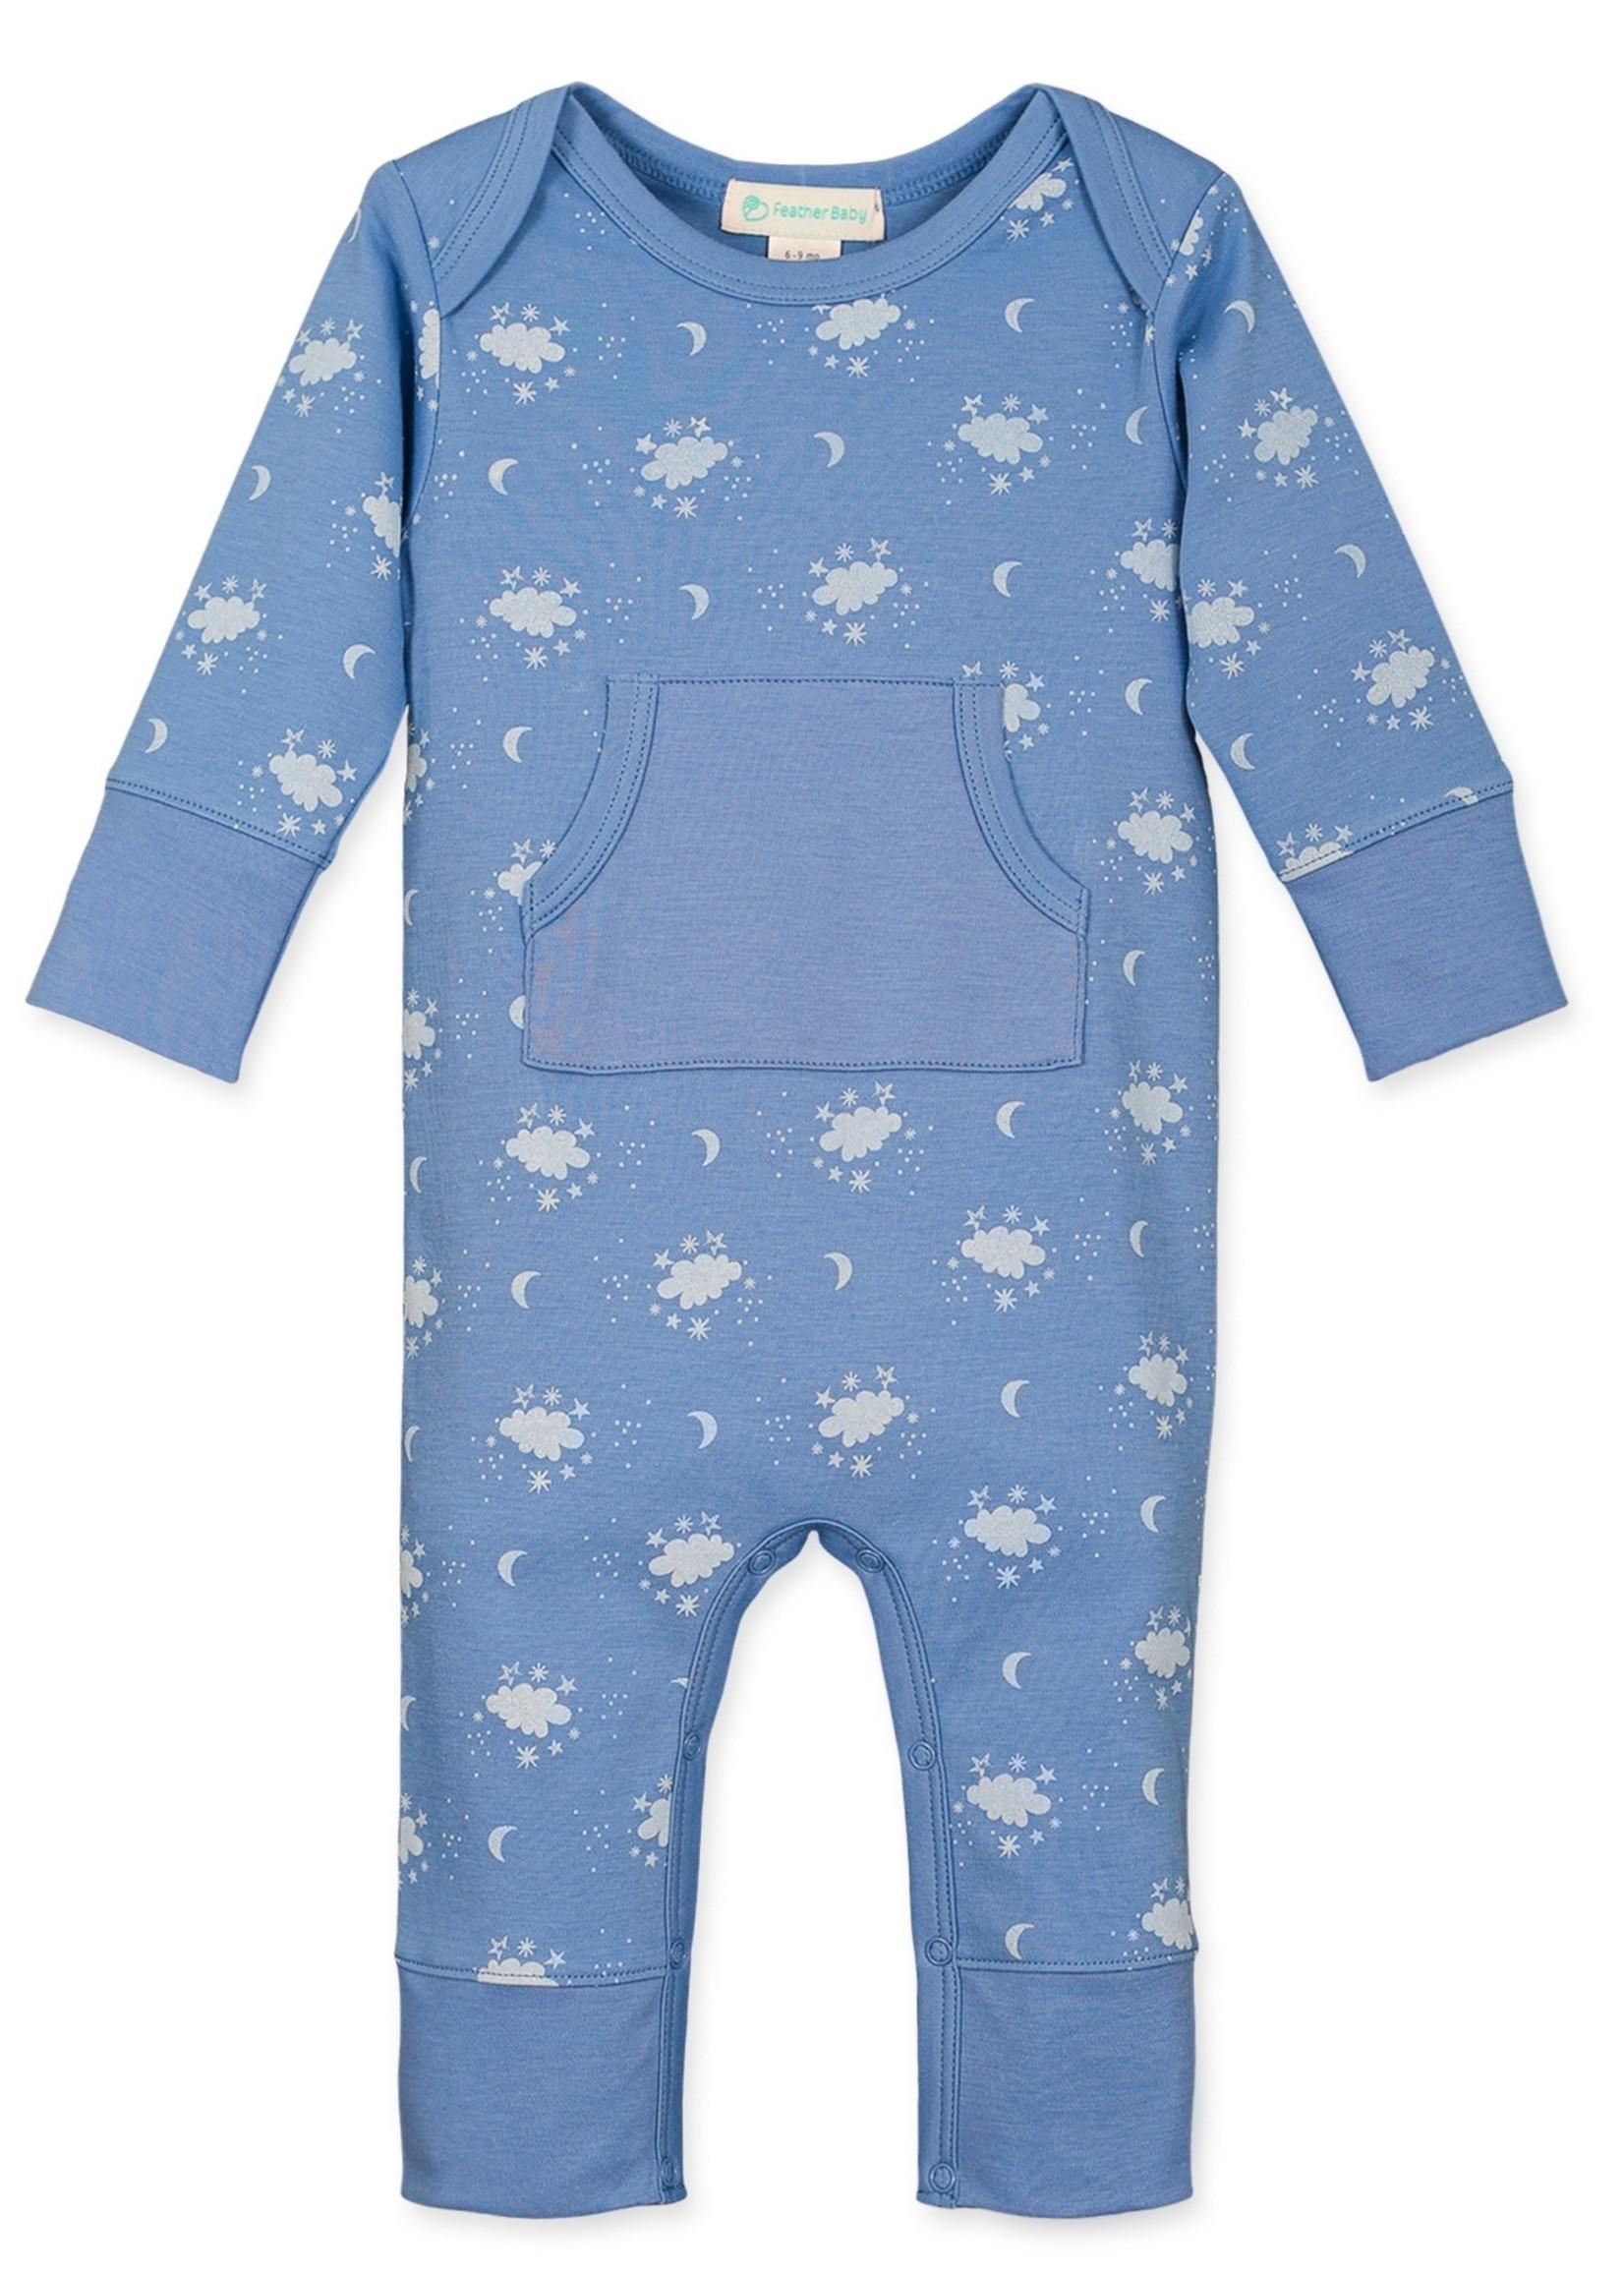 feather baby Night Sky on Cornflower Blue Romper